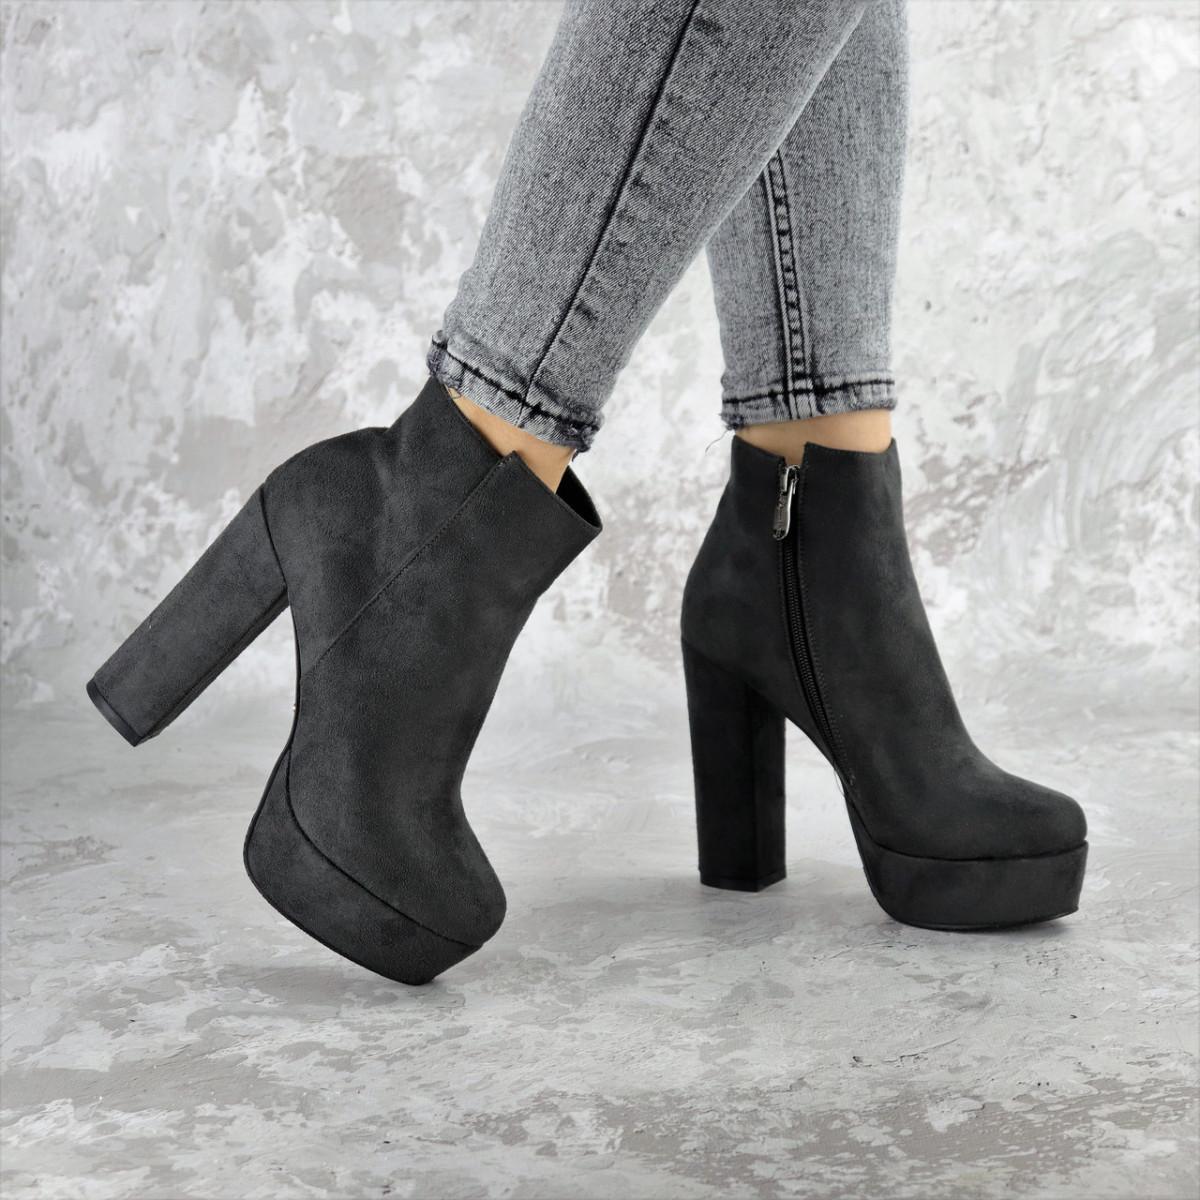 Ботинки женские на каблуке серые Dorf 2383 (35 размер)